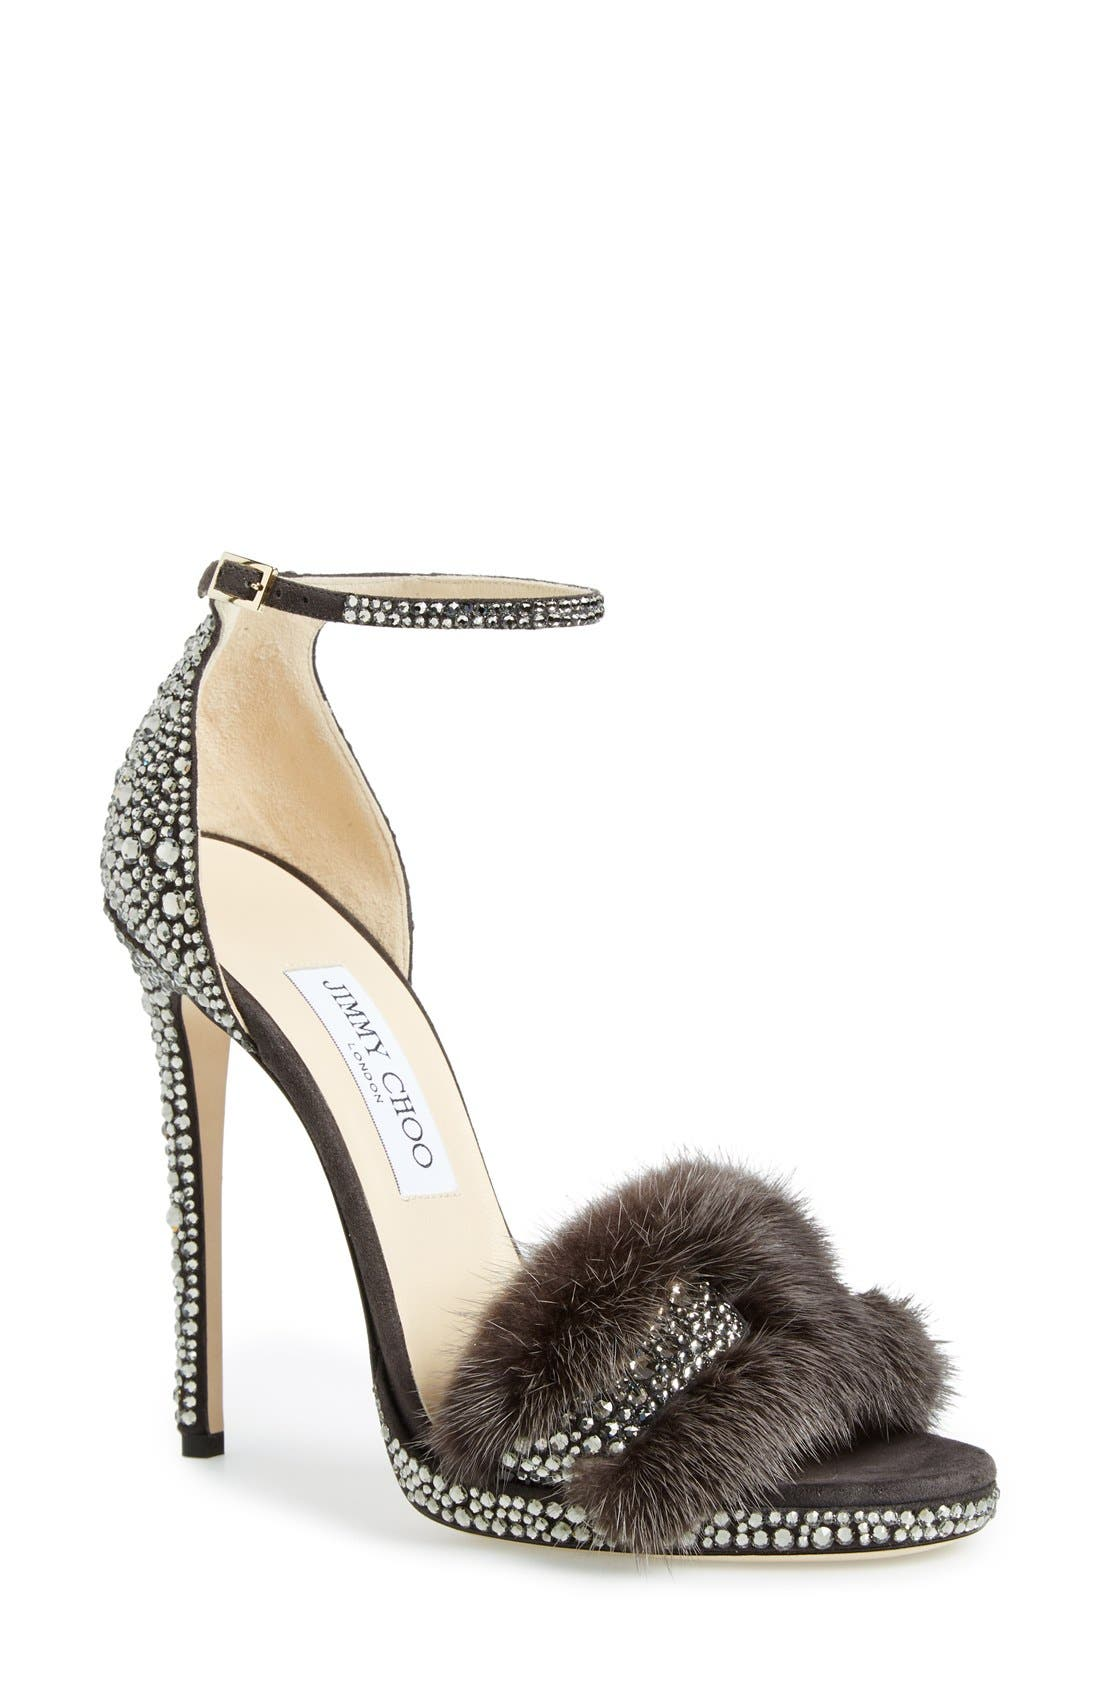 JIMMY CHOO, 'Kaylee' Genuine Mink Fur Sandal, Main thumbnail 1, color, 025